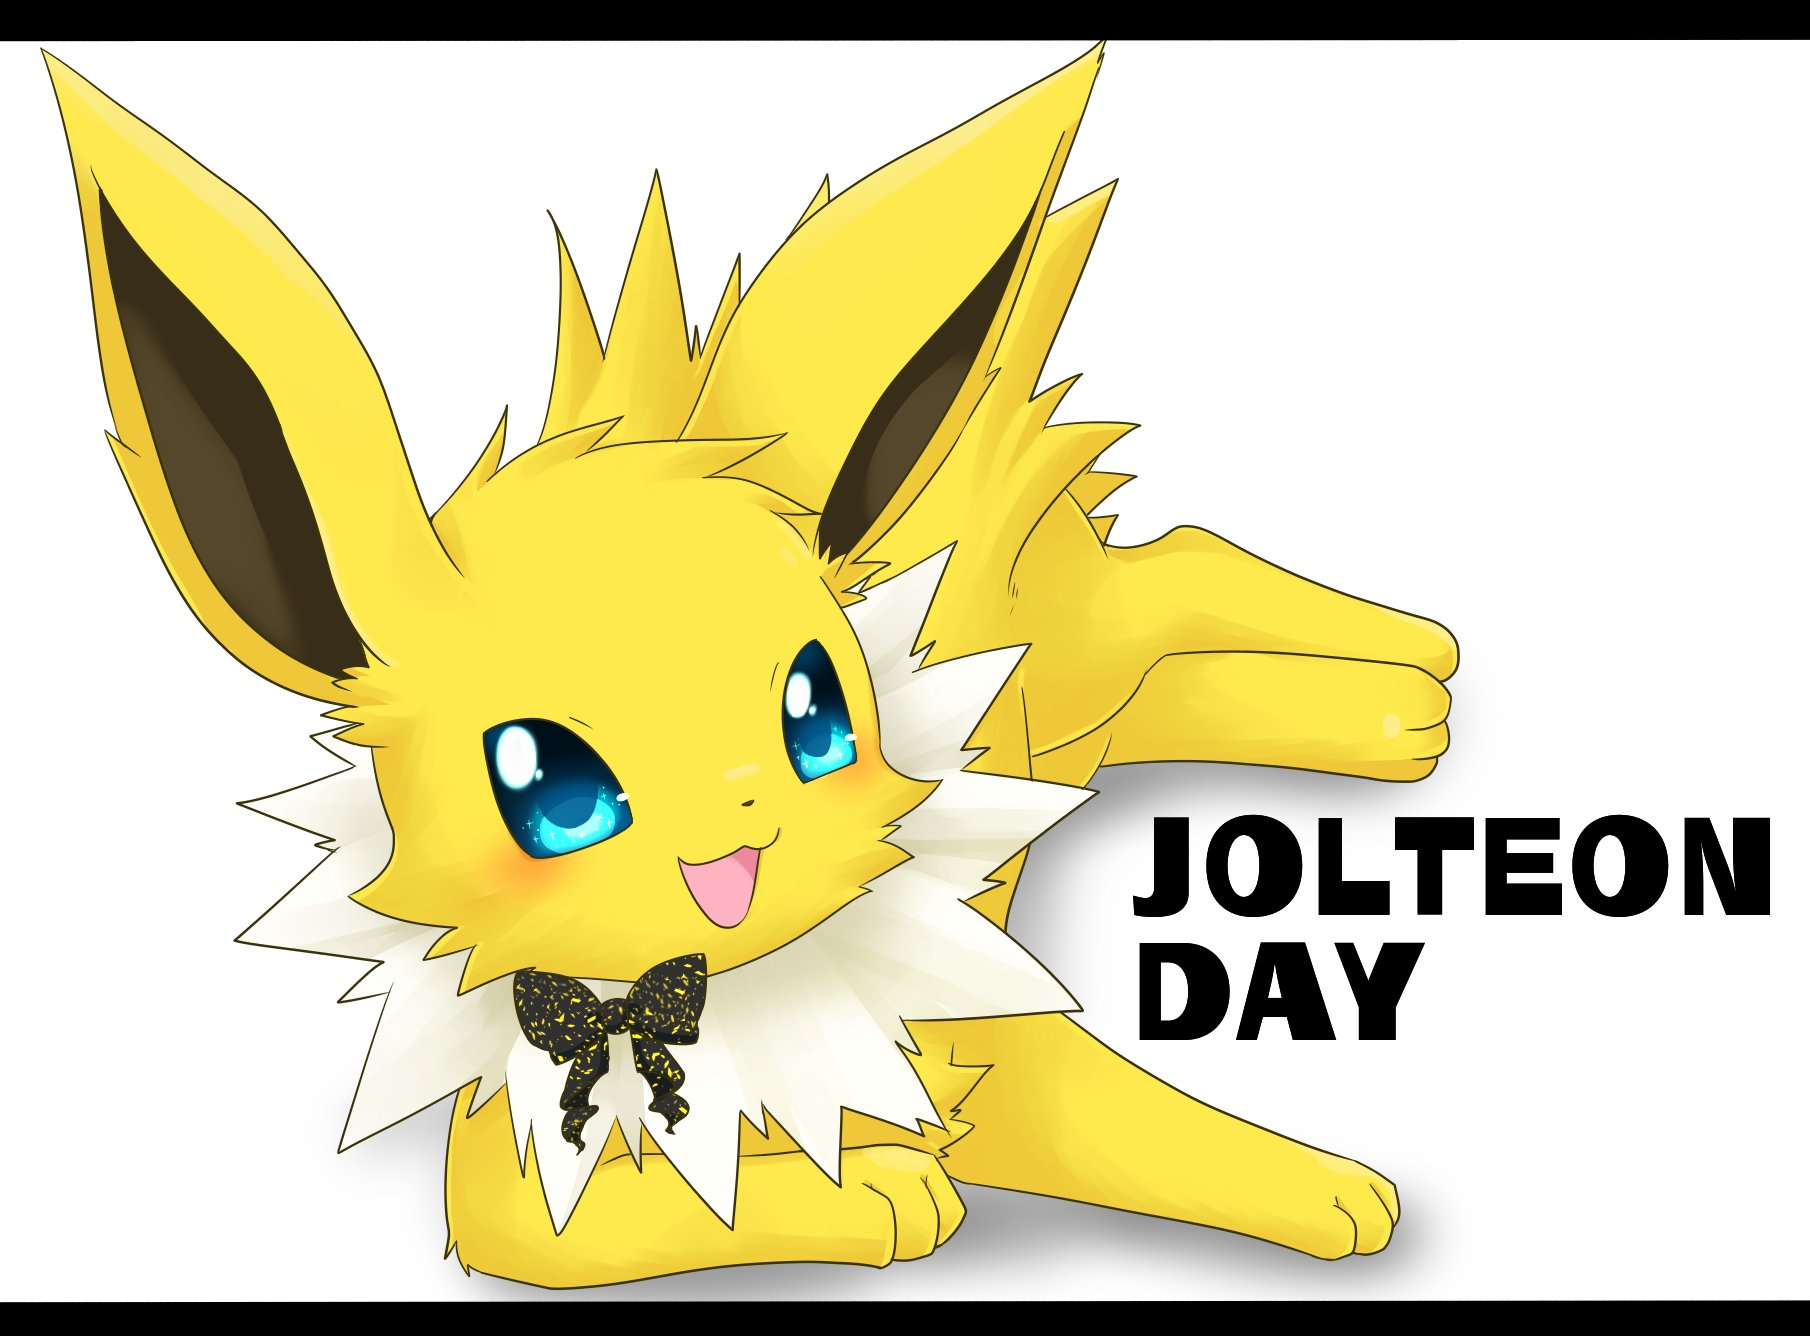 Jolteon (With images) Pokemon manga, Pokemon eevee, Dog